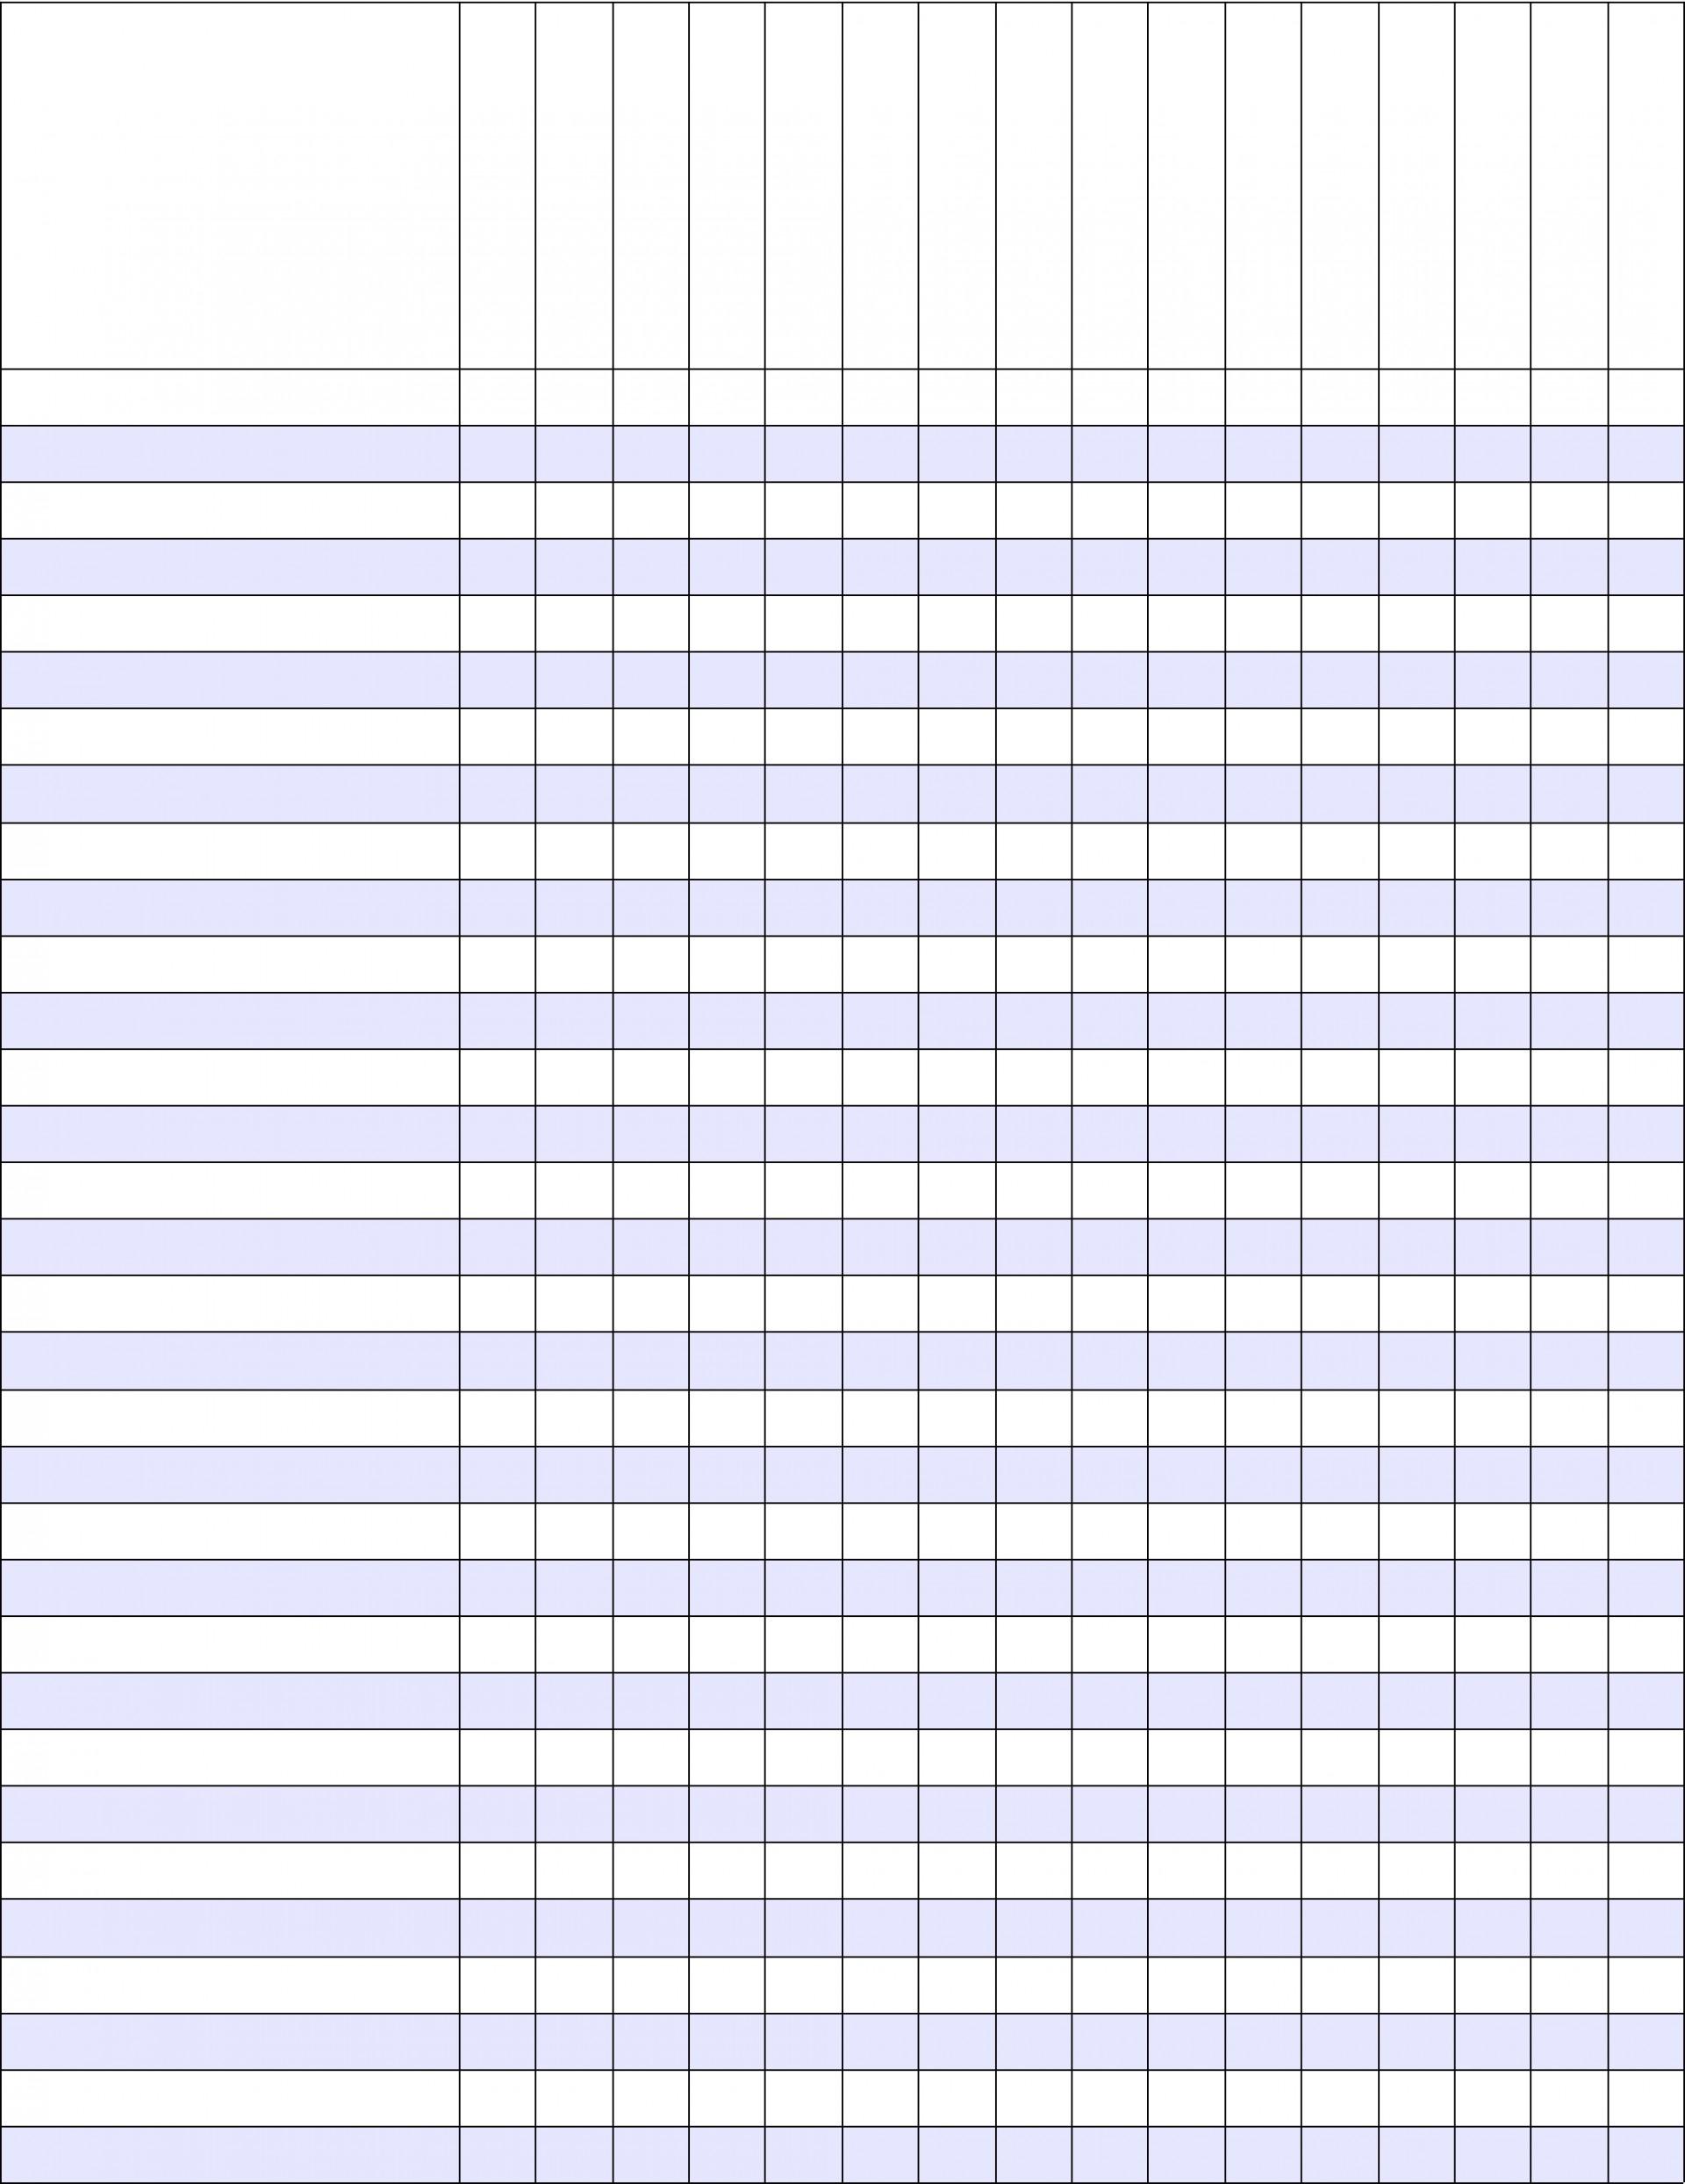 021 Teacher Grade Book Template Ideas Free Plot Diagram - Free Printable Gradebook